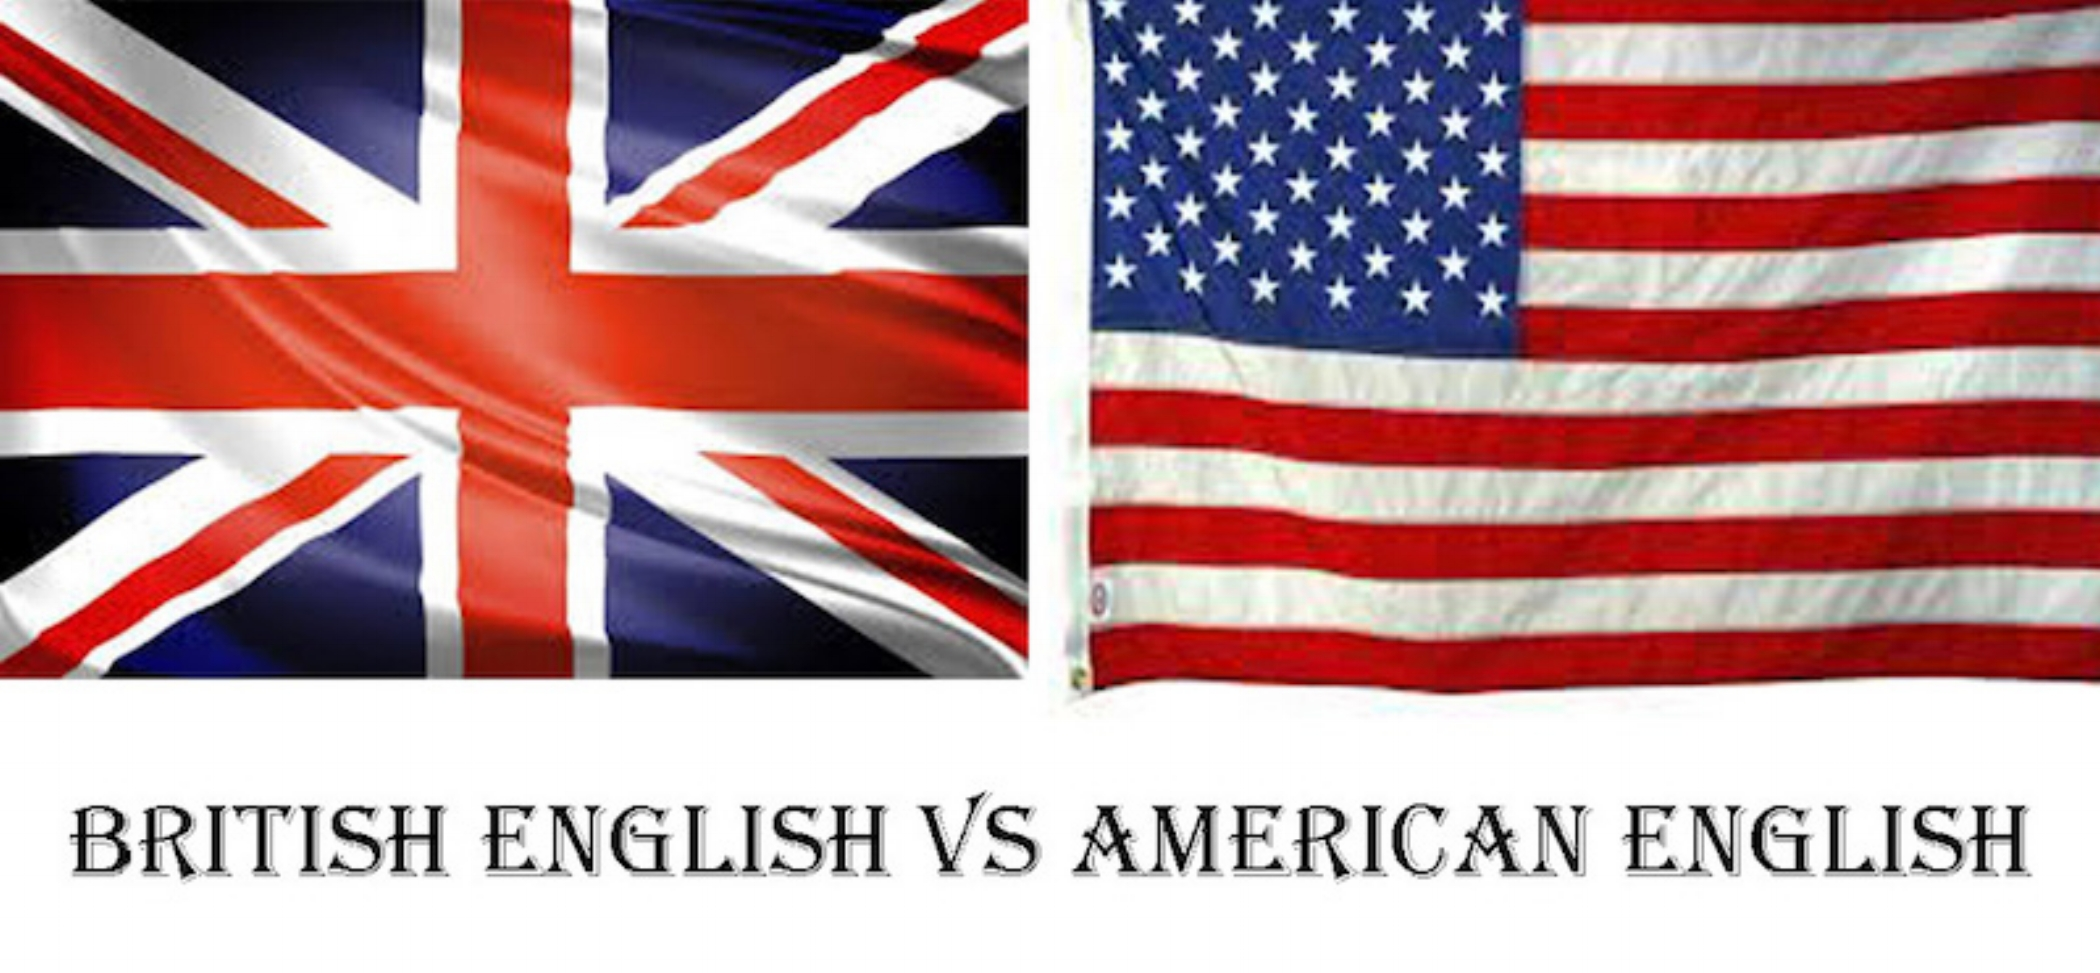 British English VS American English Flags